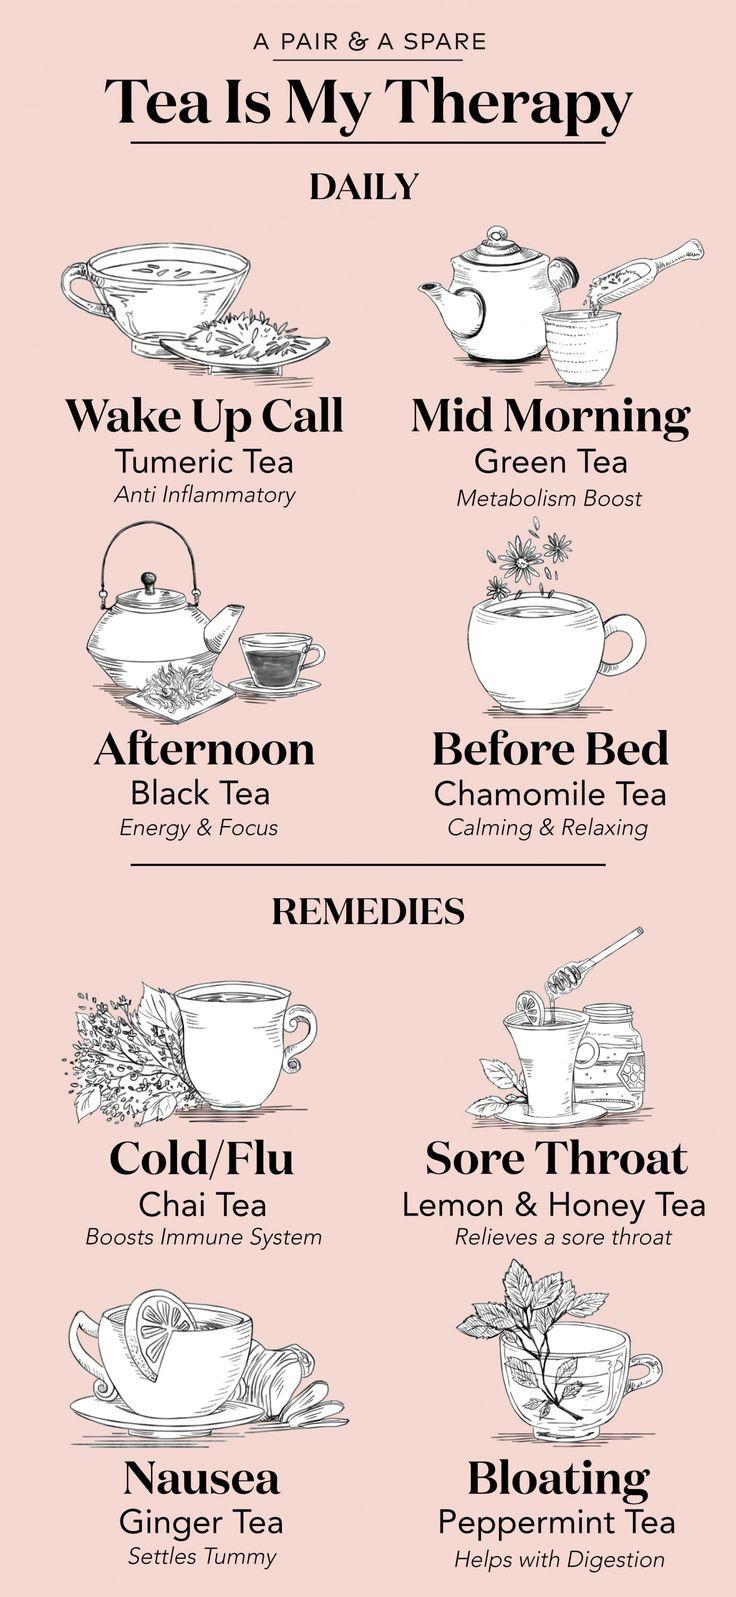 http://apairandasparediy.com/2017/06/tea-is-my-therapy/